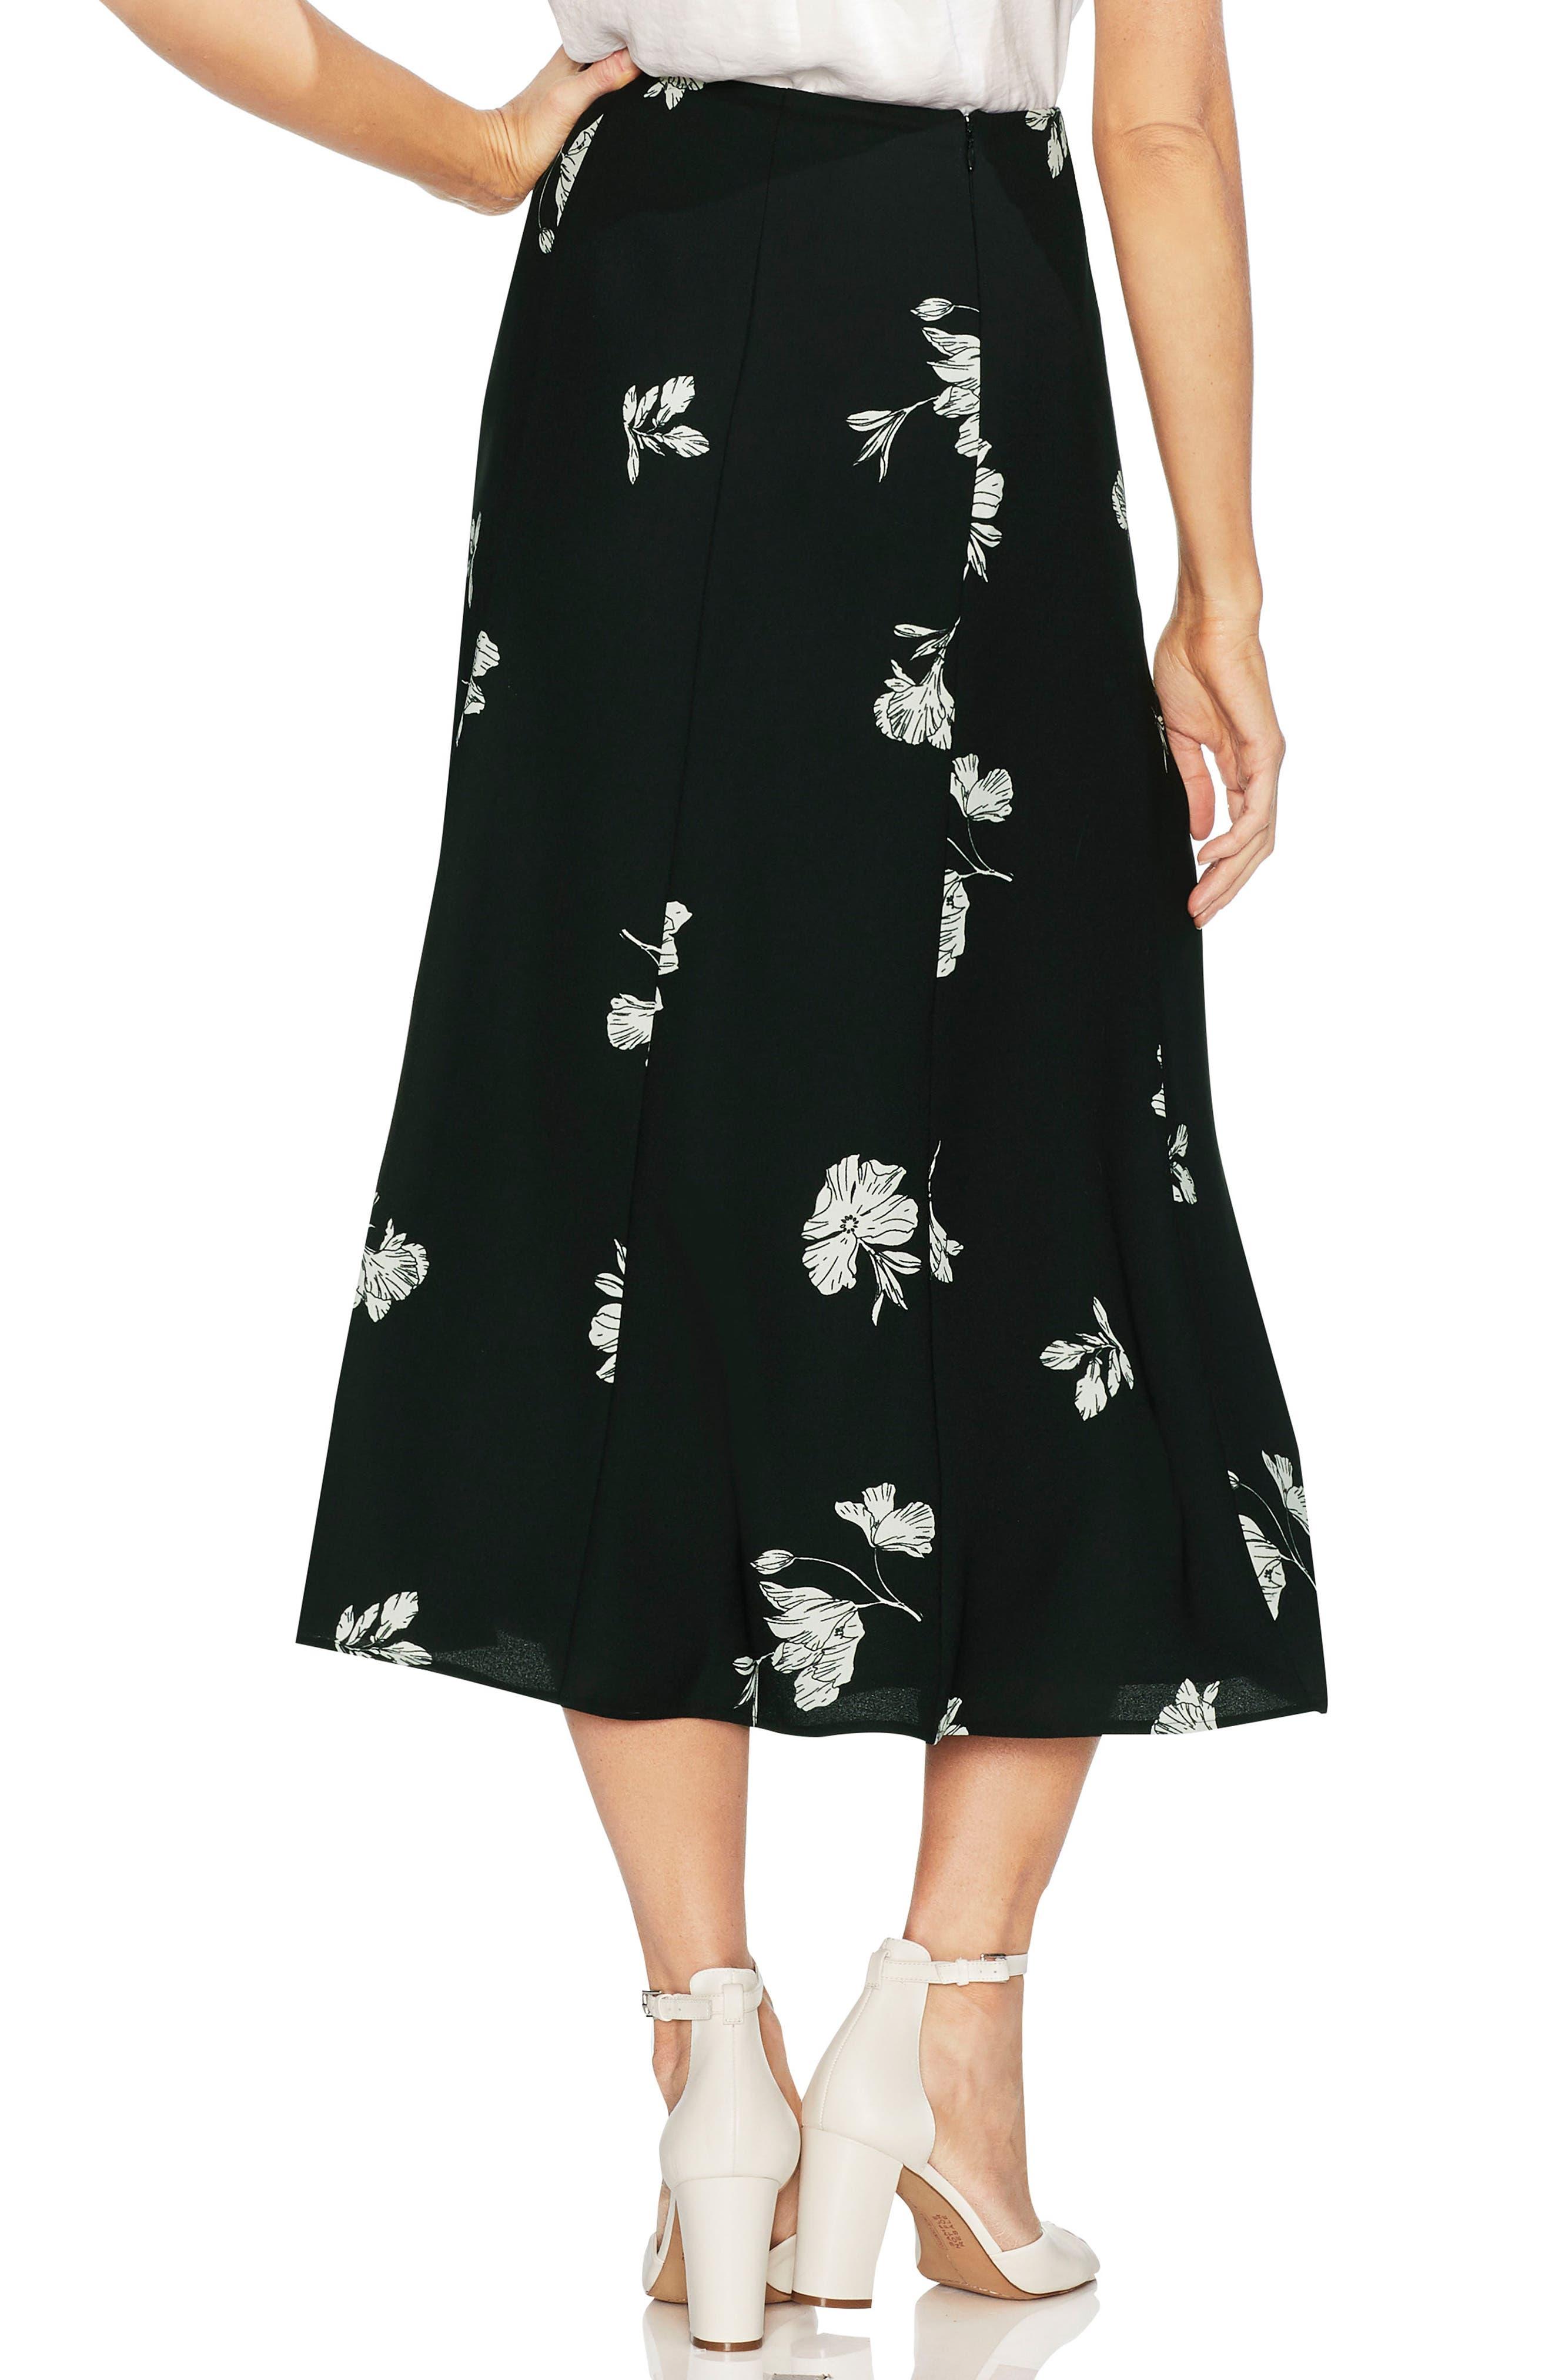 VINCE CAMUTO, Floral Print Skirt, Alternate thumbnail 2, color, 006